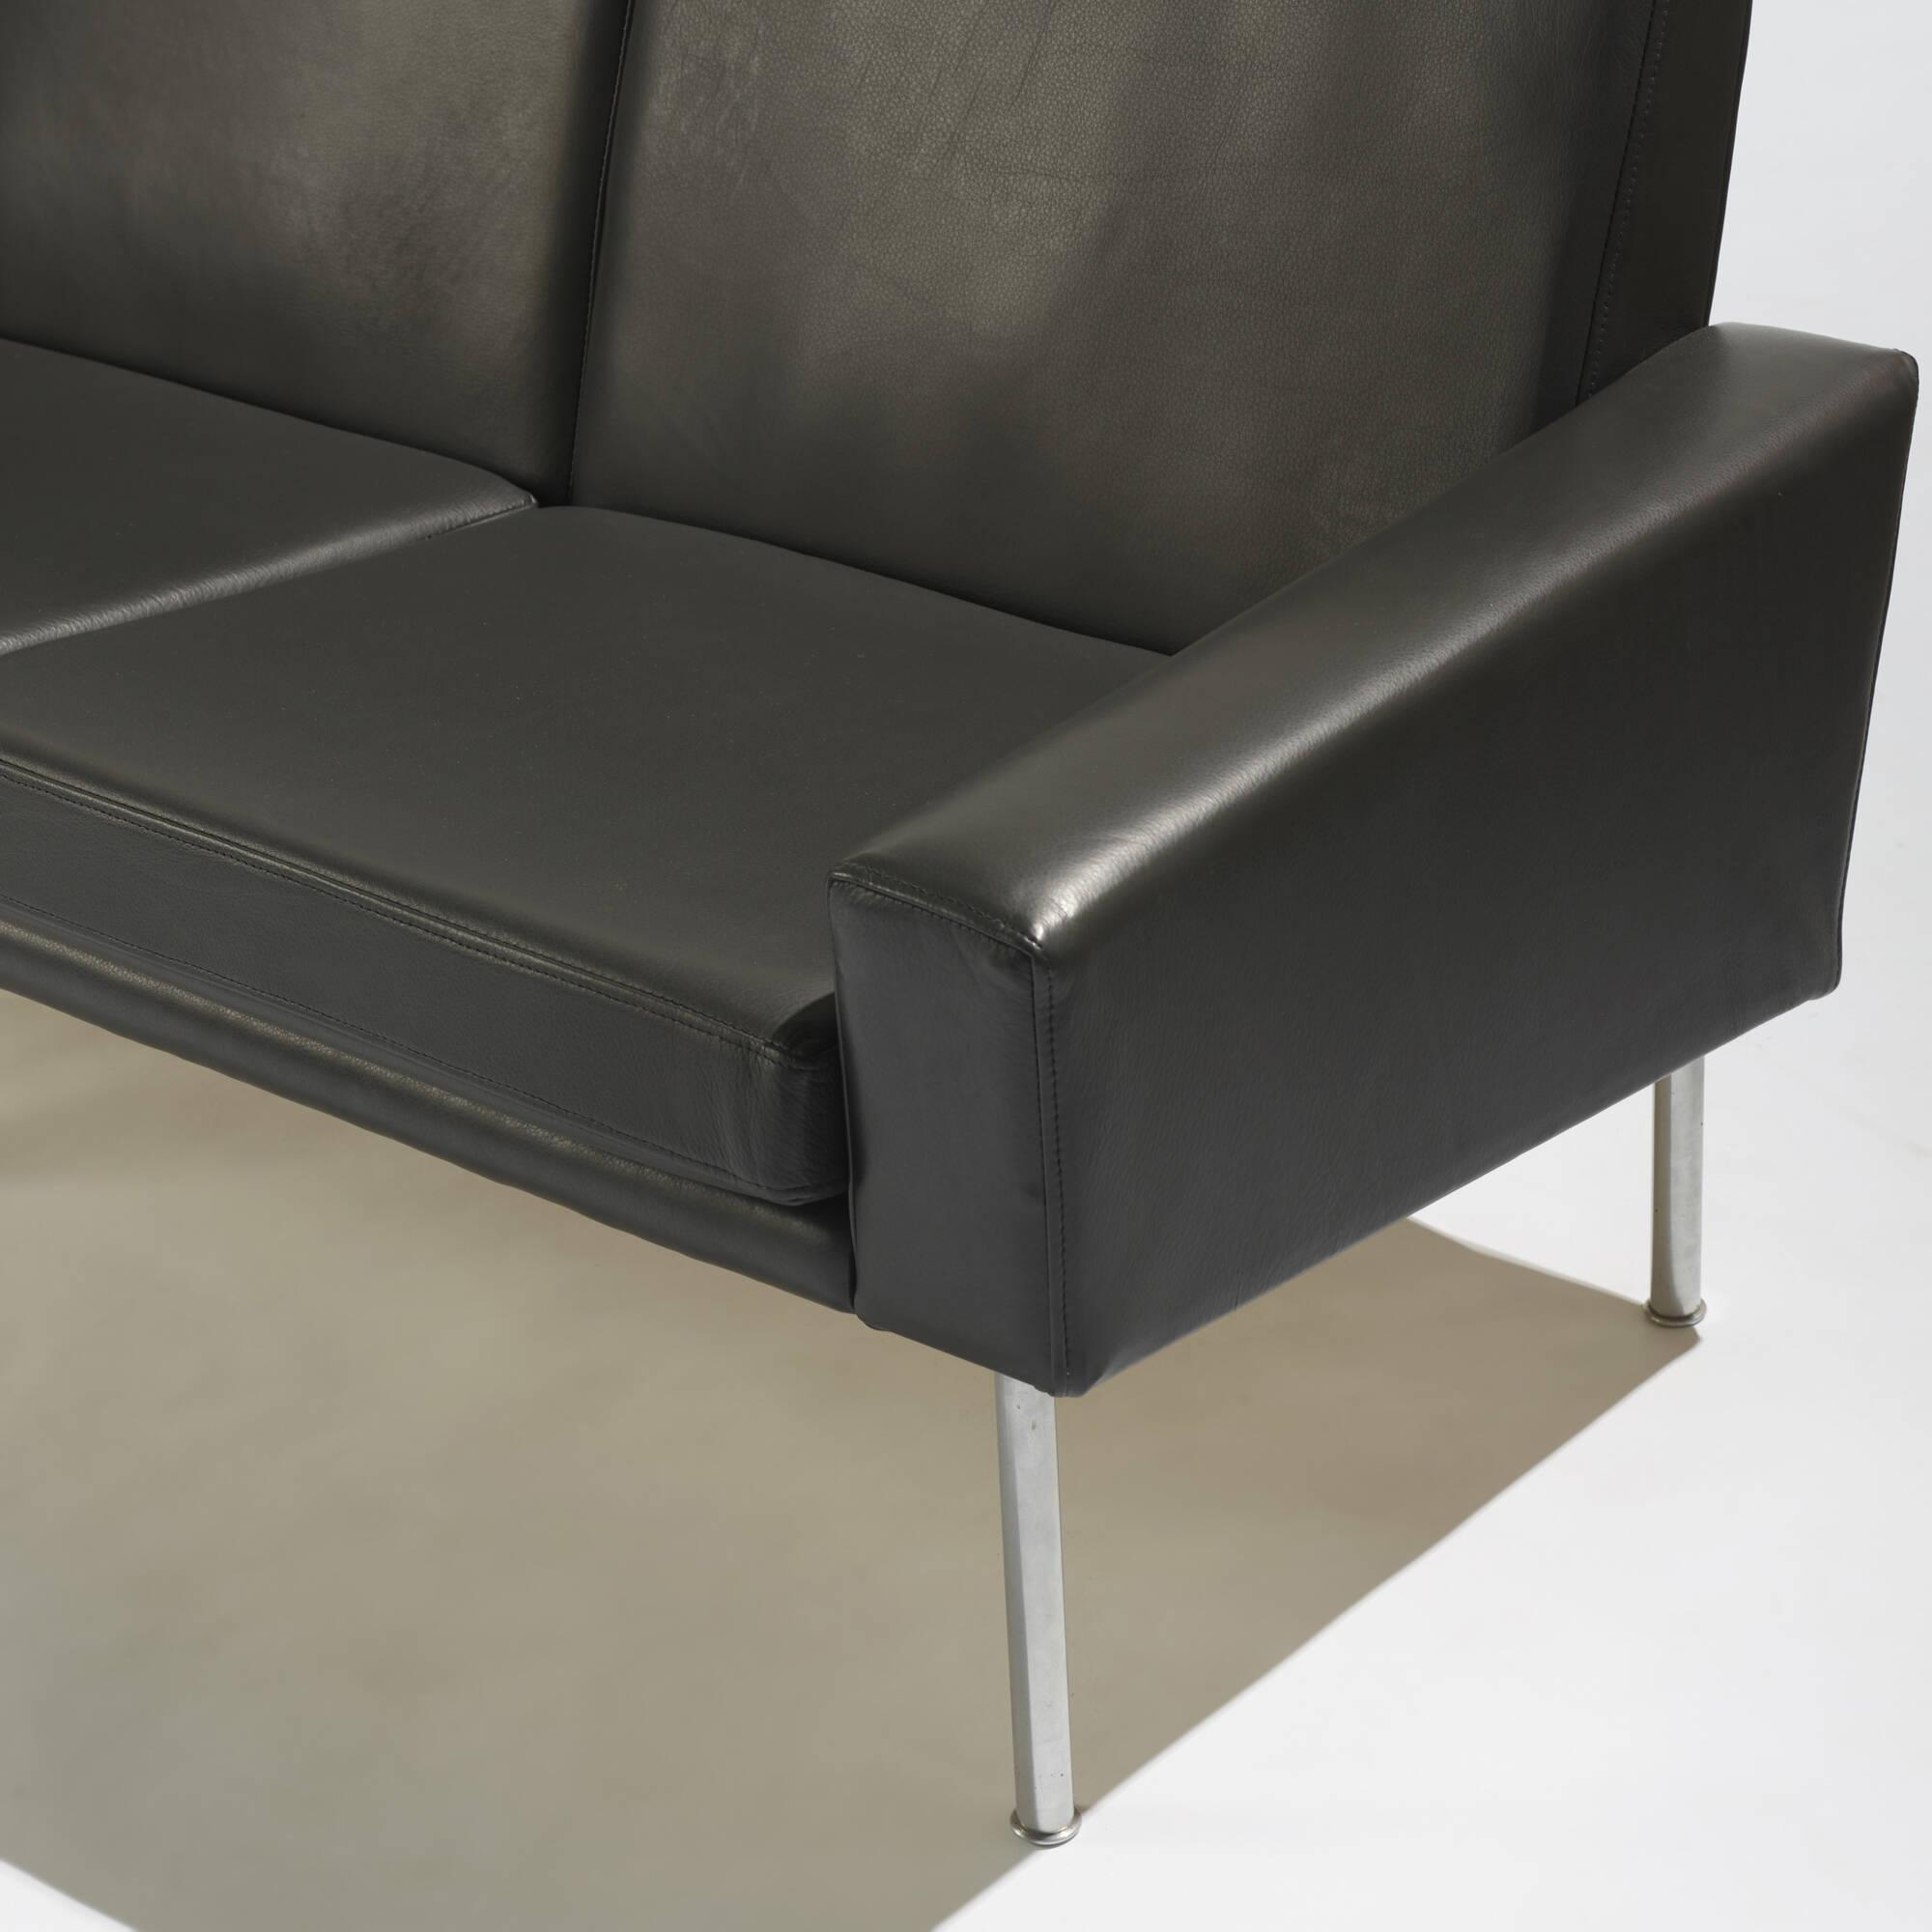 363 Hans J Wegner Sofa Model Ap 34 3 Scandinavian Design 18